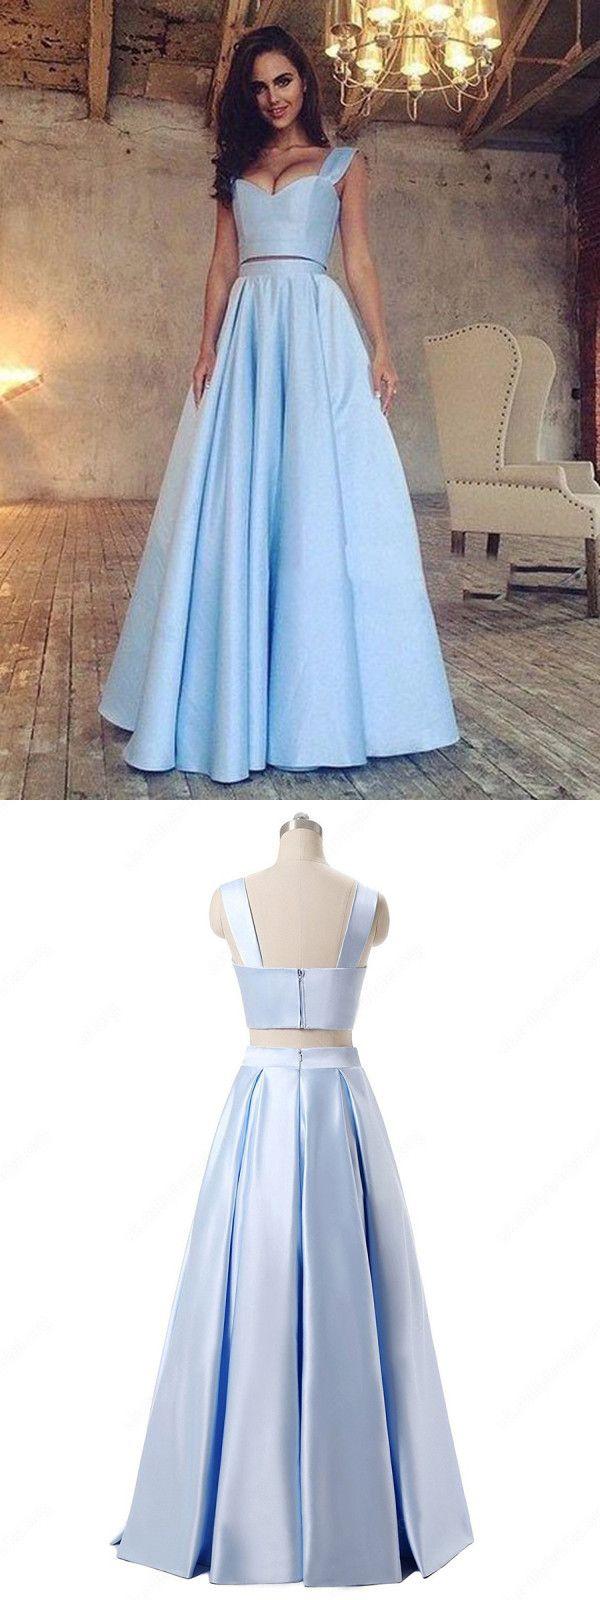 Two piece prom dress modest beautiful simple cheap long prom dress